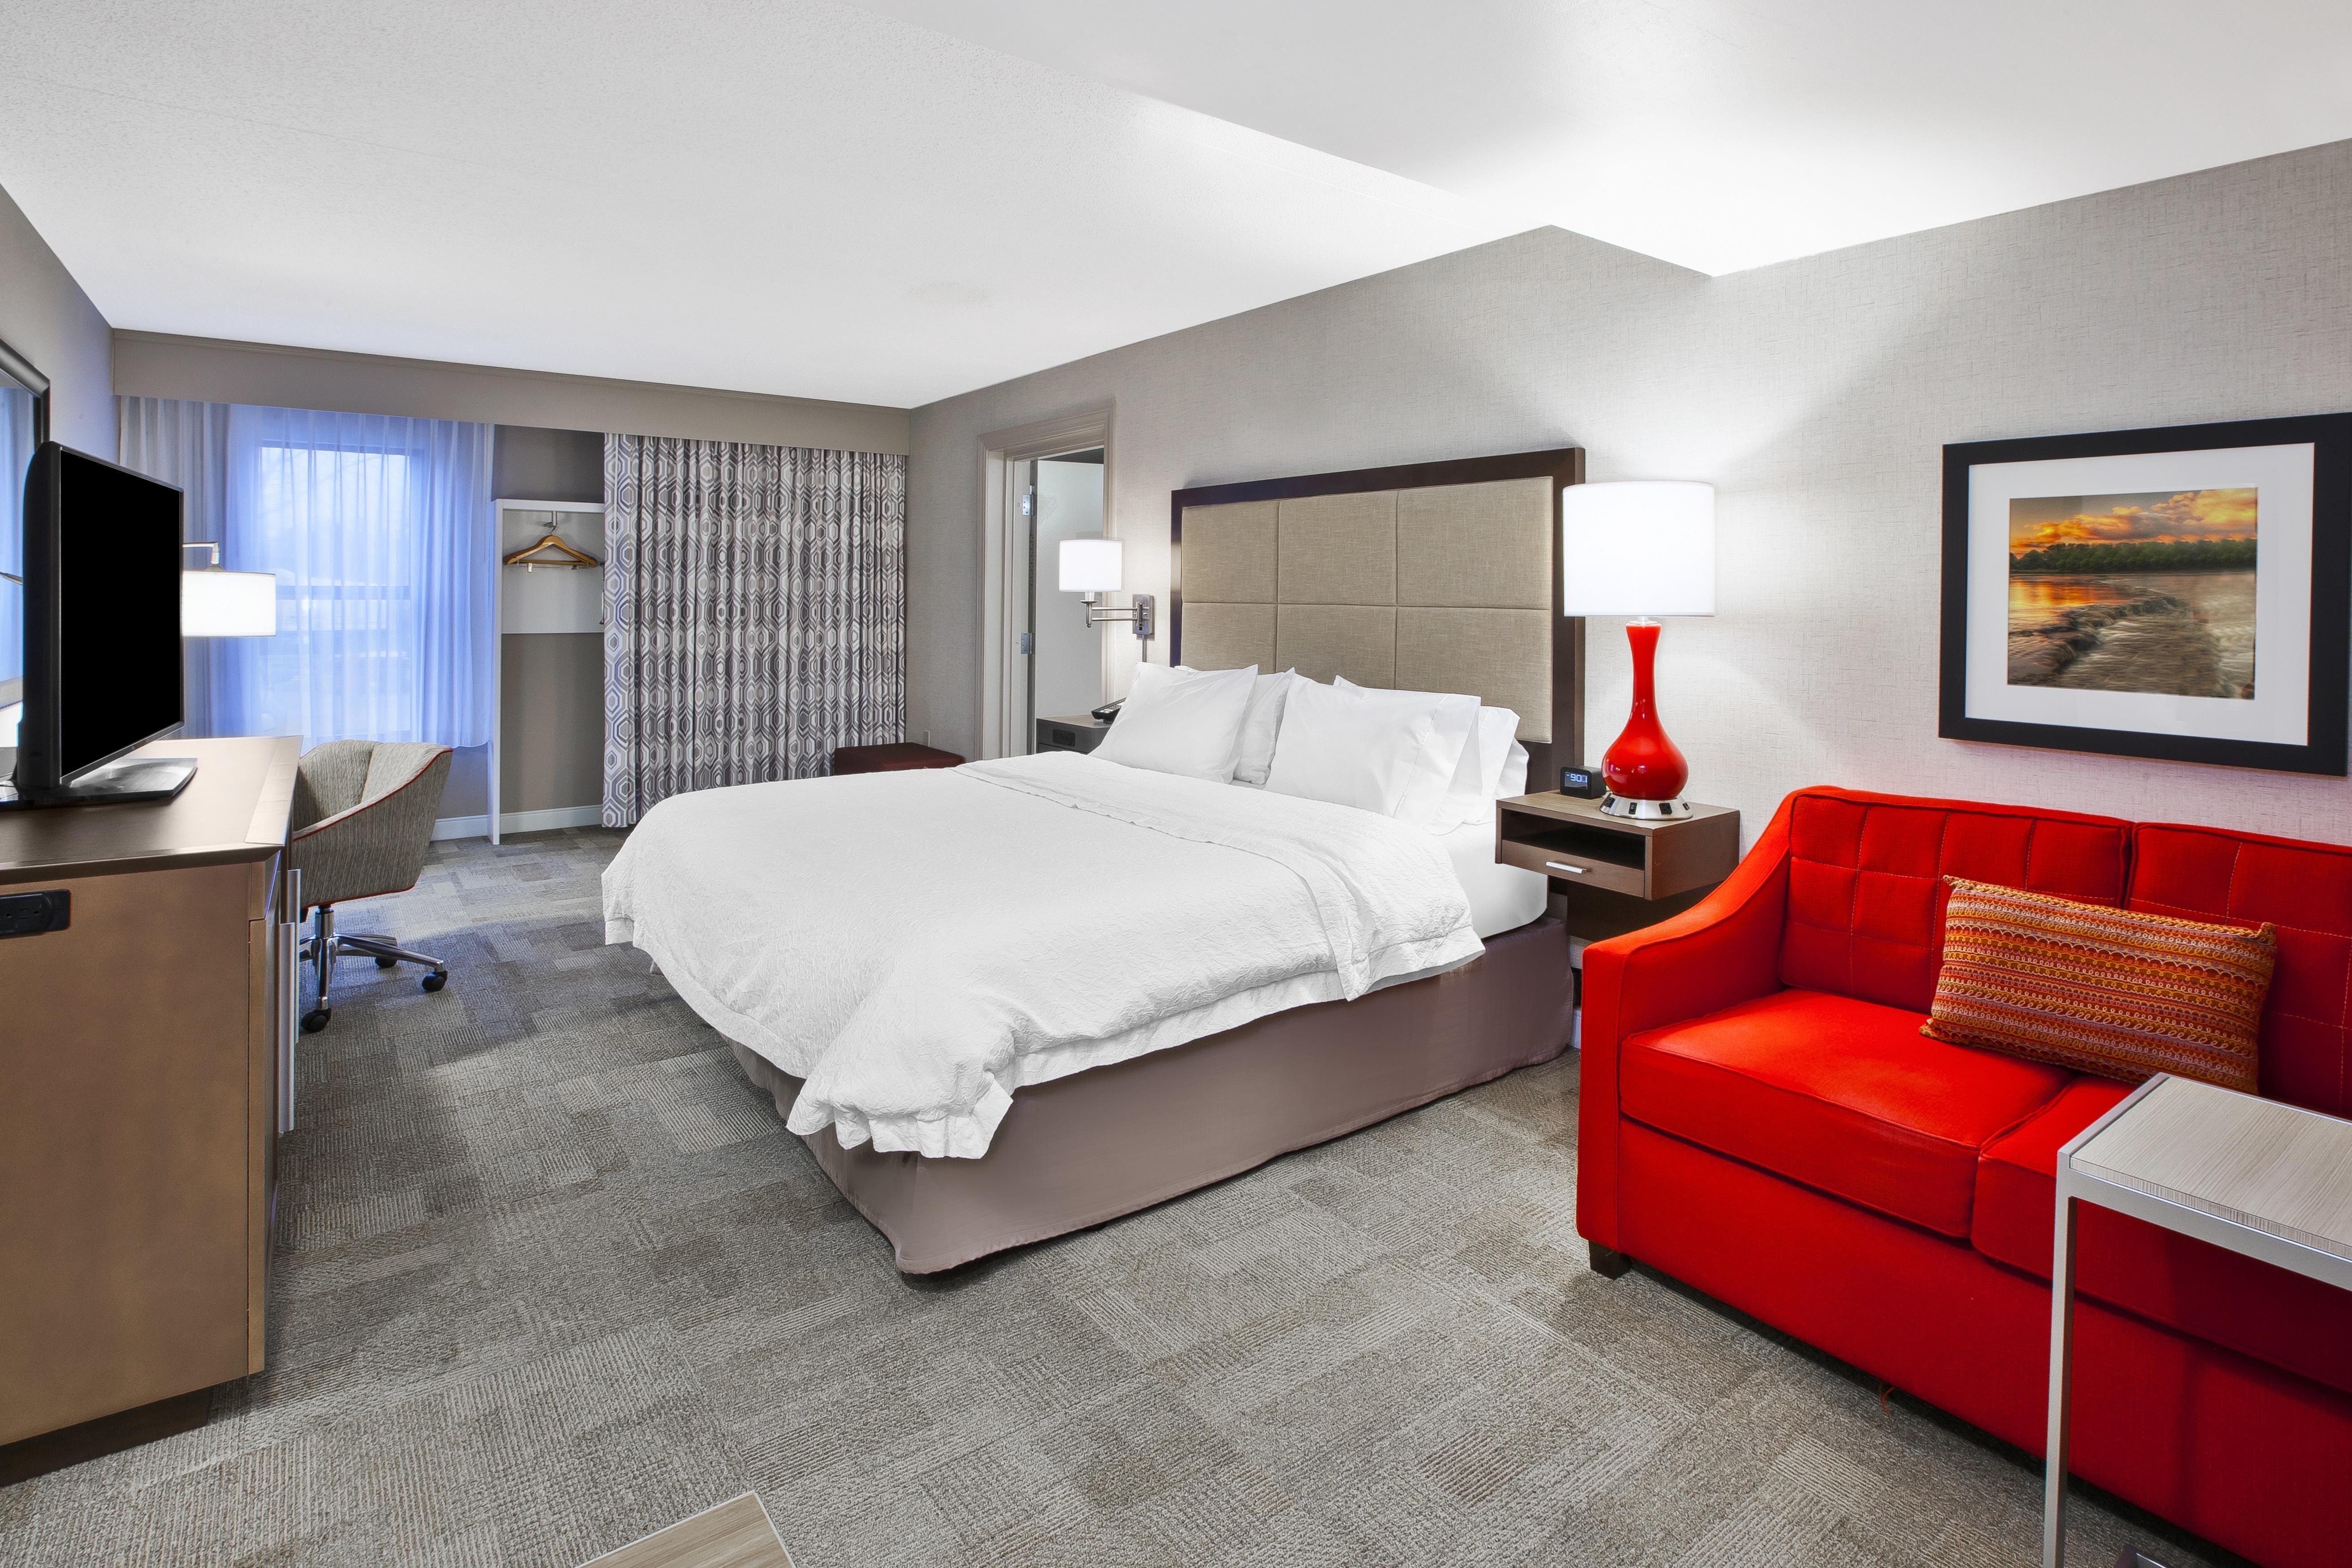 Hampton Inn Toledo-South/Maumee image 7